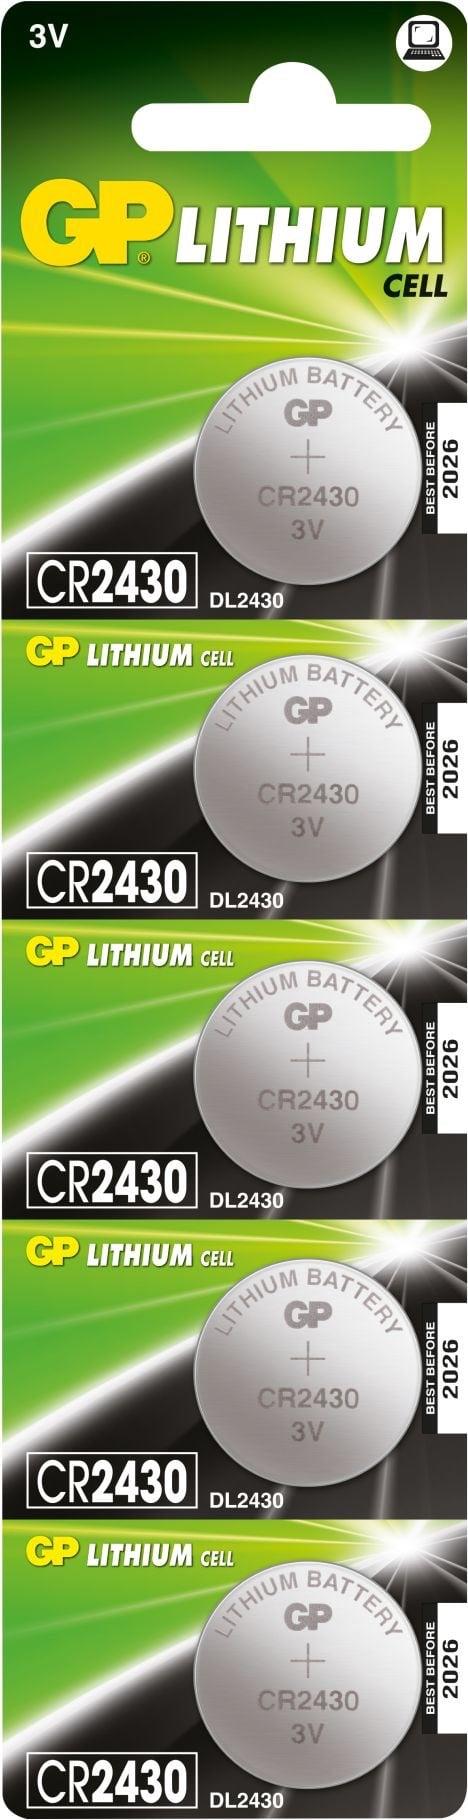 [tag] 5 stk. CR 2430 3 Volt Lithium batteri Knapbatterier (3V)